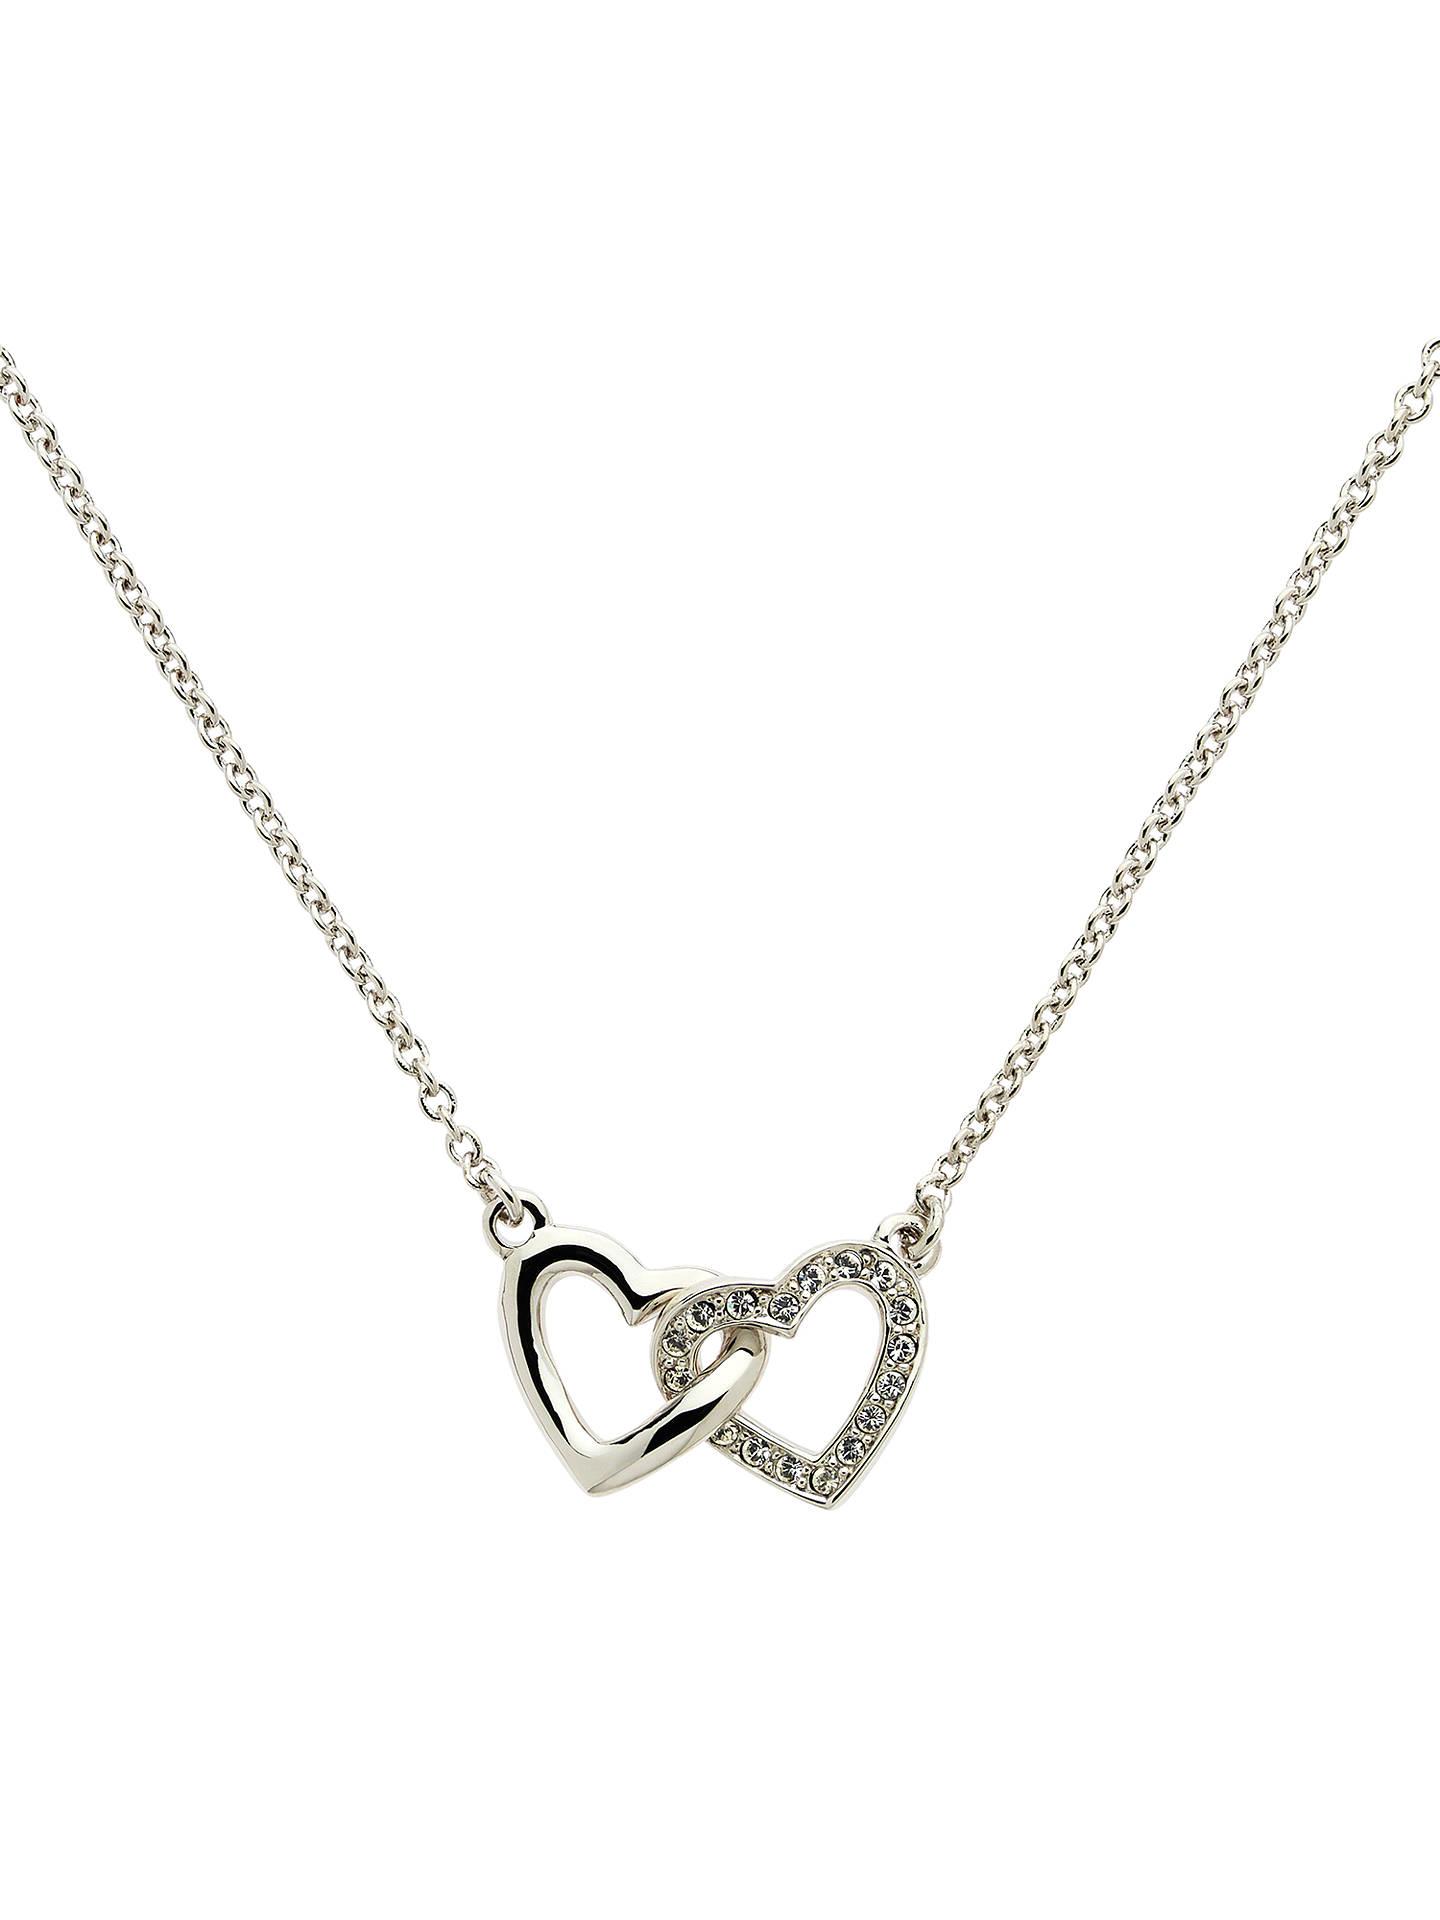 0a046ef65744c Melissa Odabash Rhodium Plated Swarovski Crystal Double Heart Necklace,  Silver